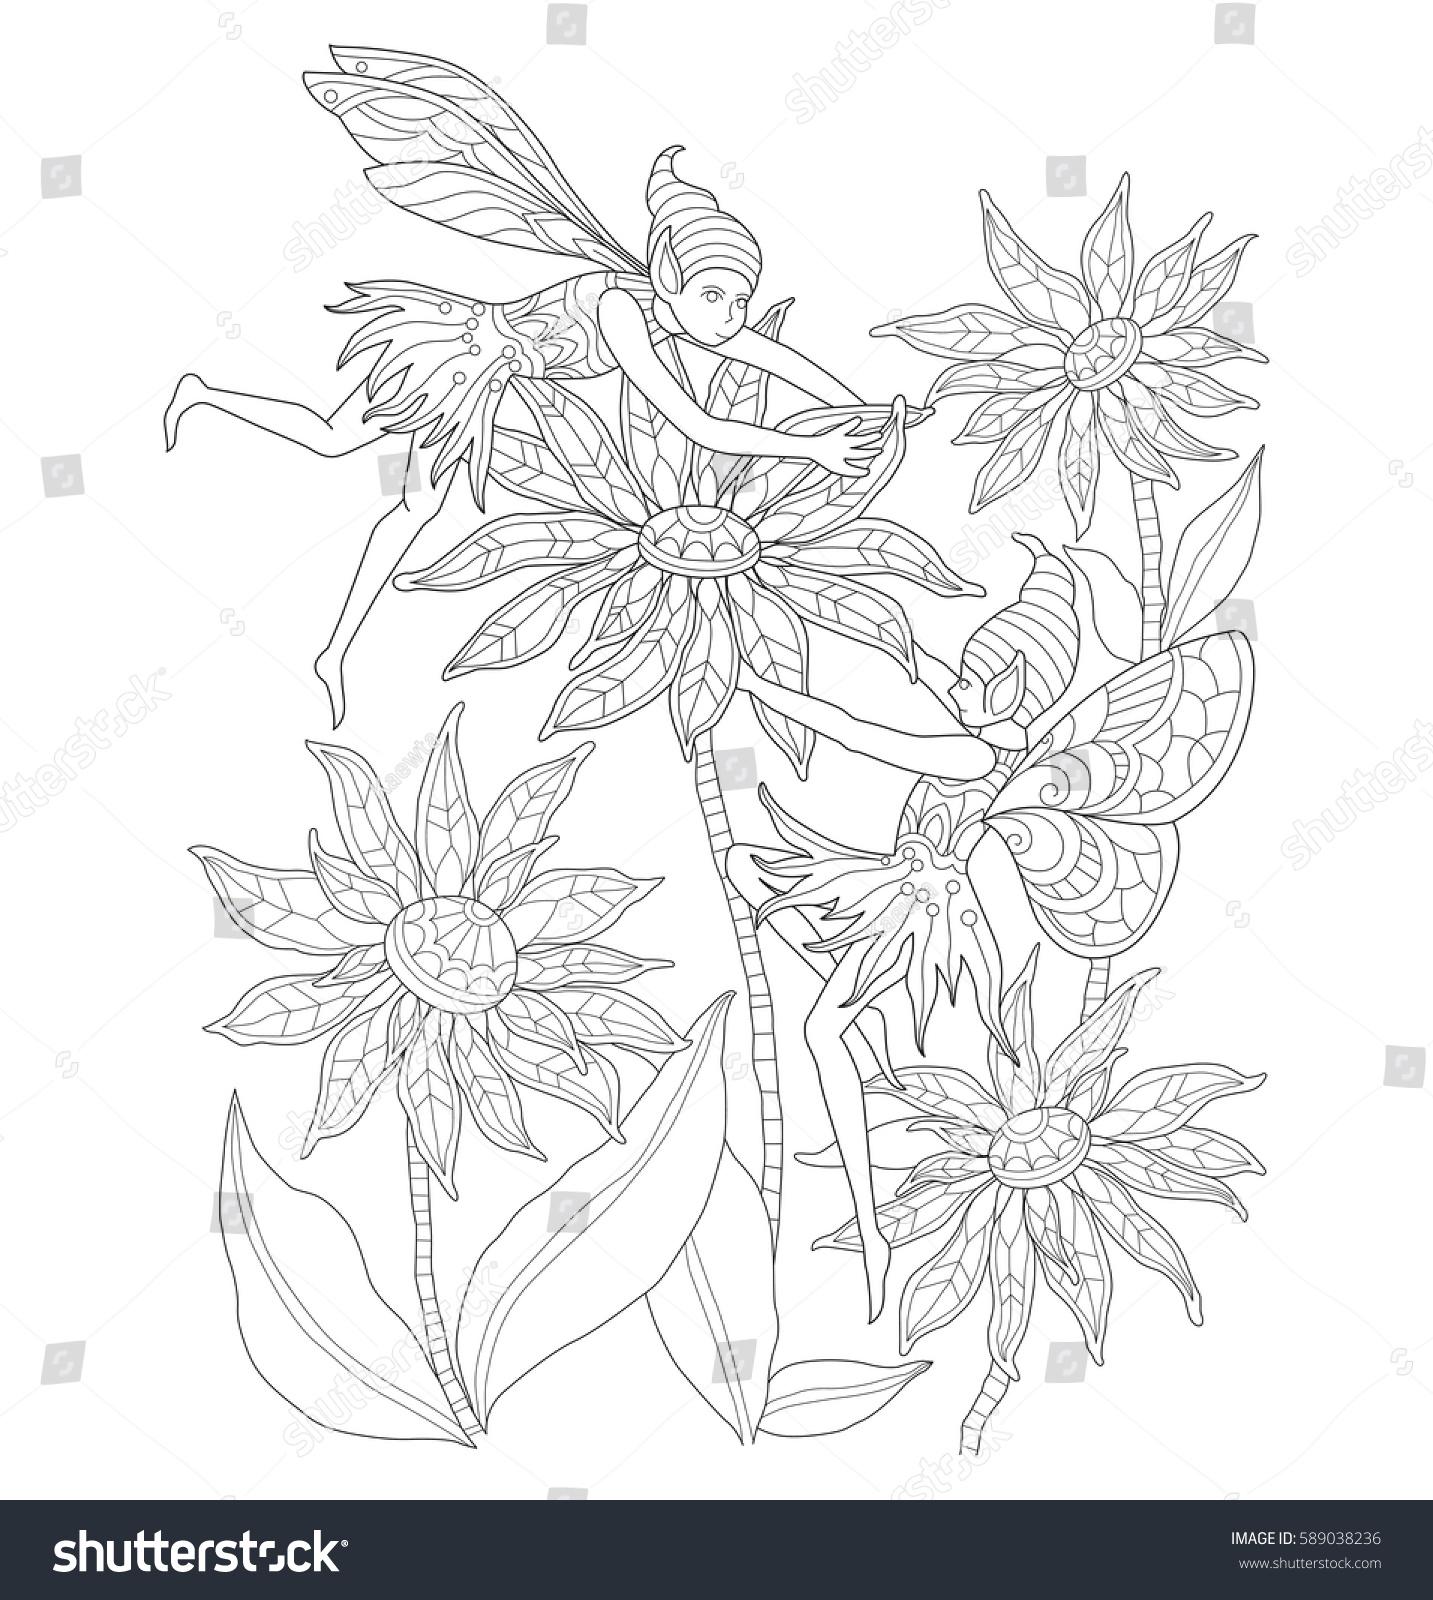 Flower garden sketch - Fairies In The Flower Garden Zentangle Stylized Cartoon Isolated On White Background Hand Drawn